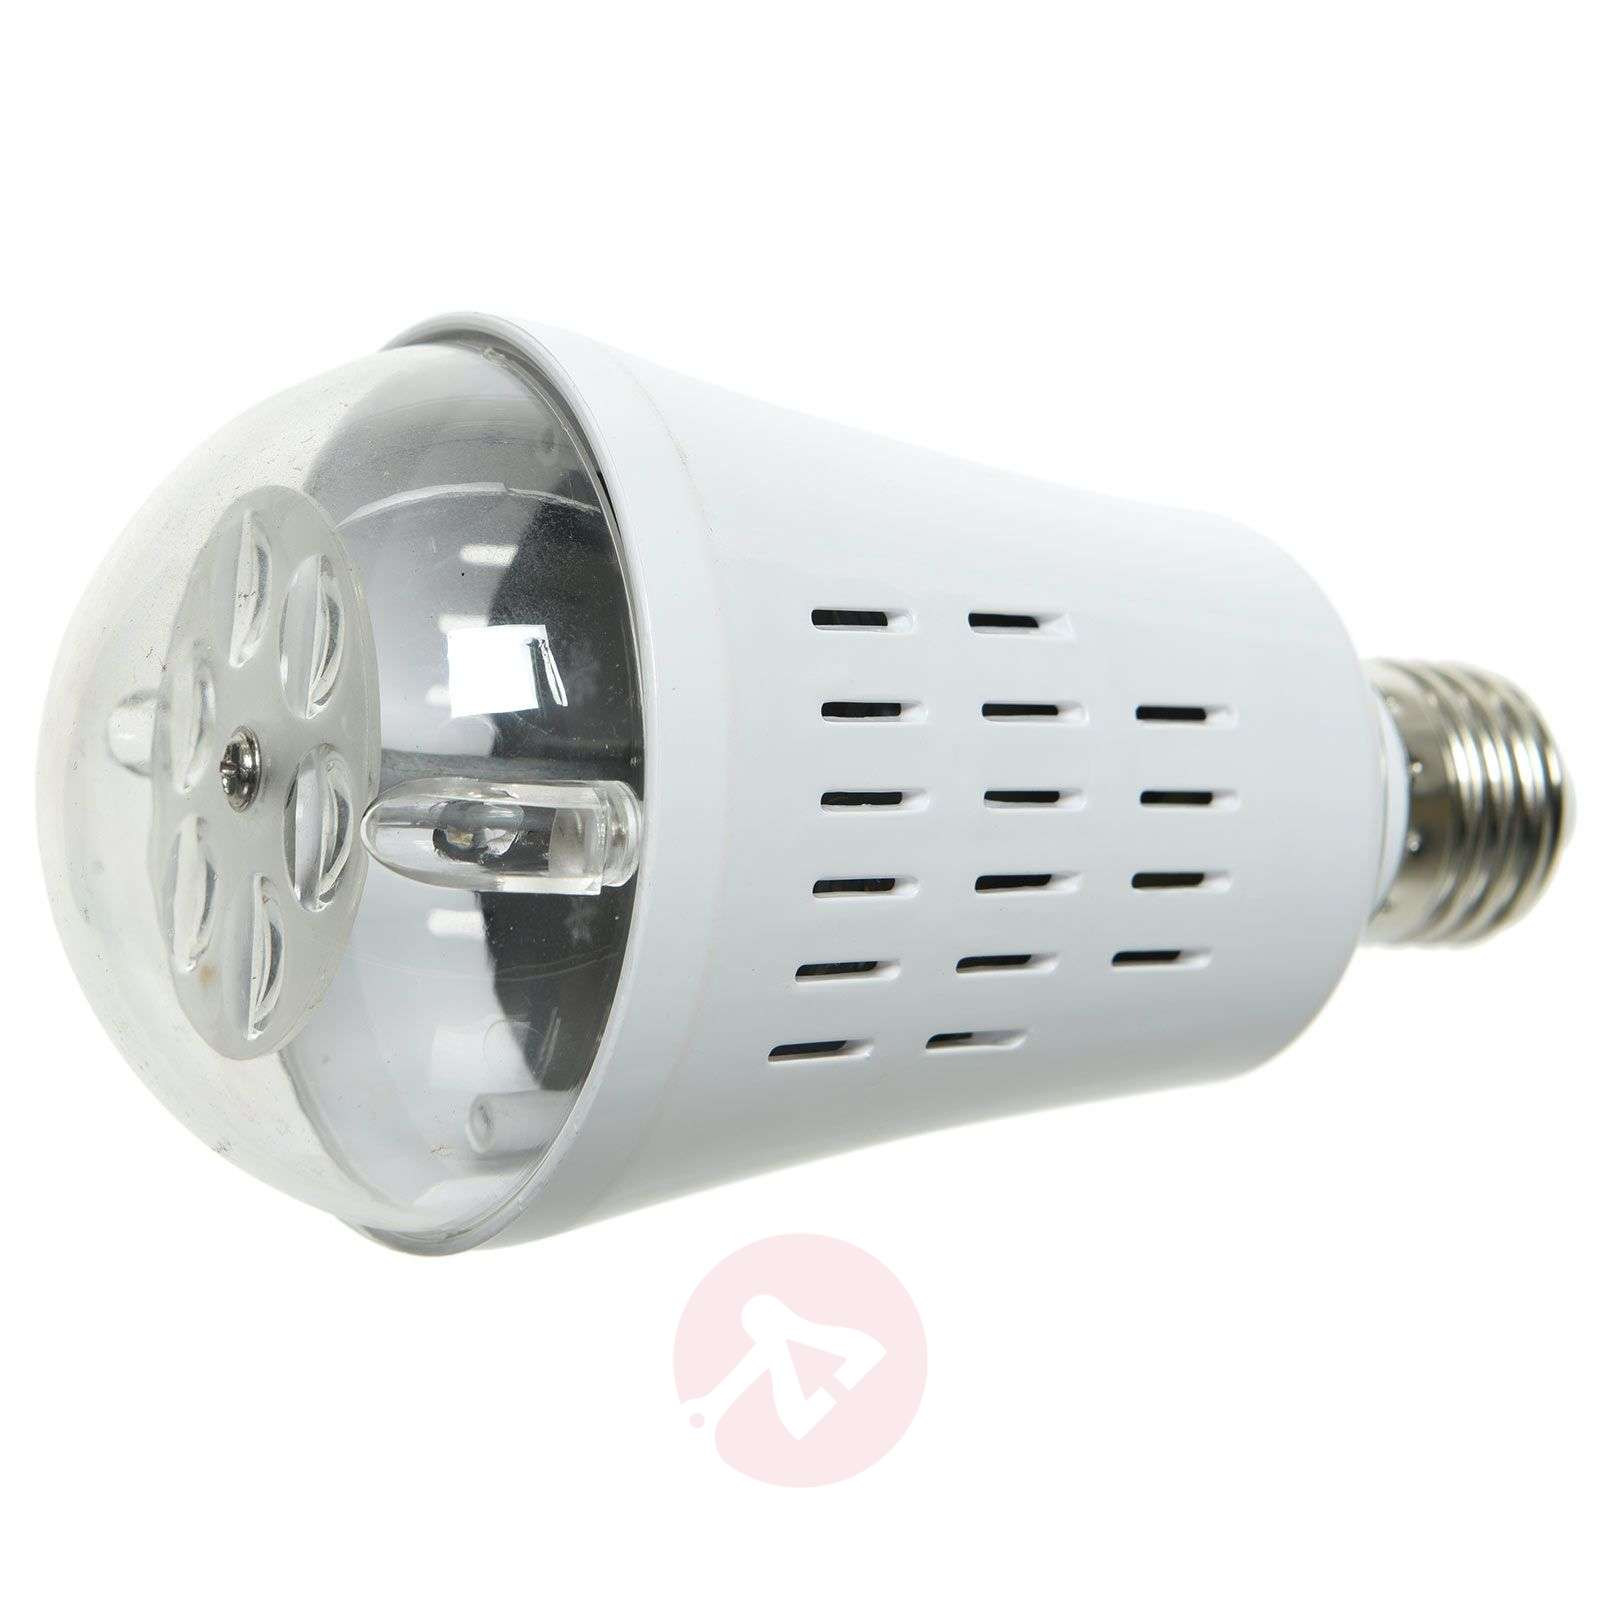 Hiutaleprojektori-kosteusaine LED E27-5527189-01